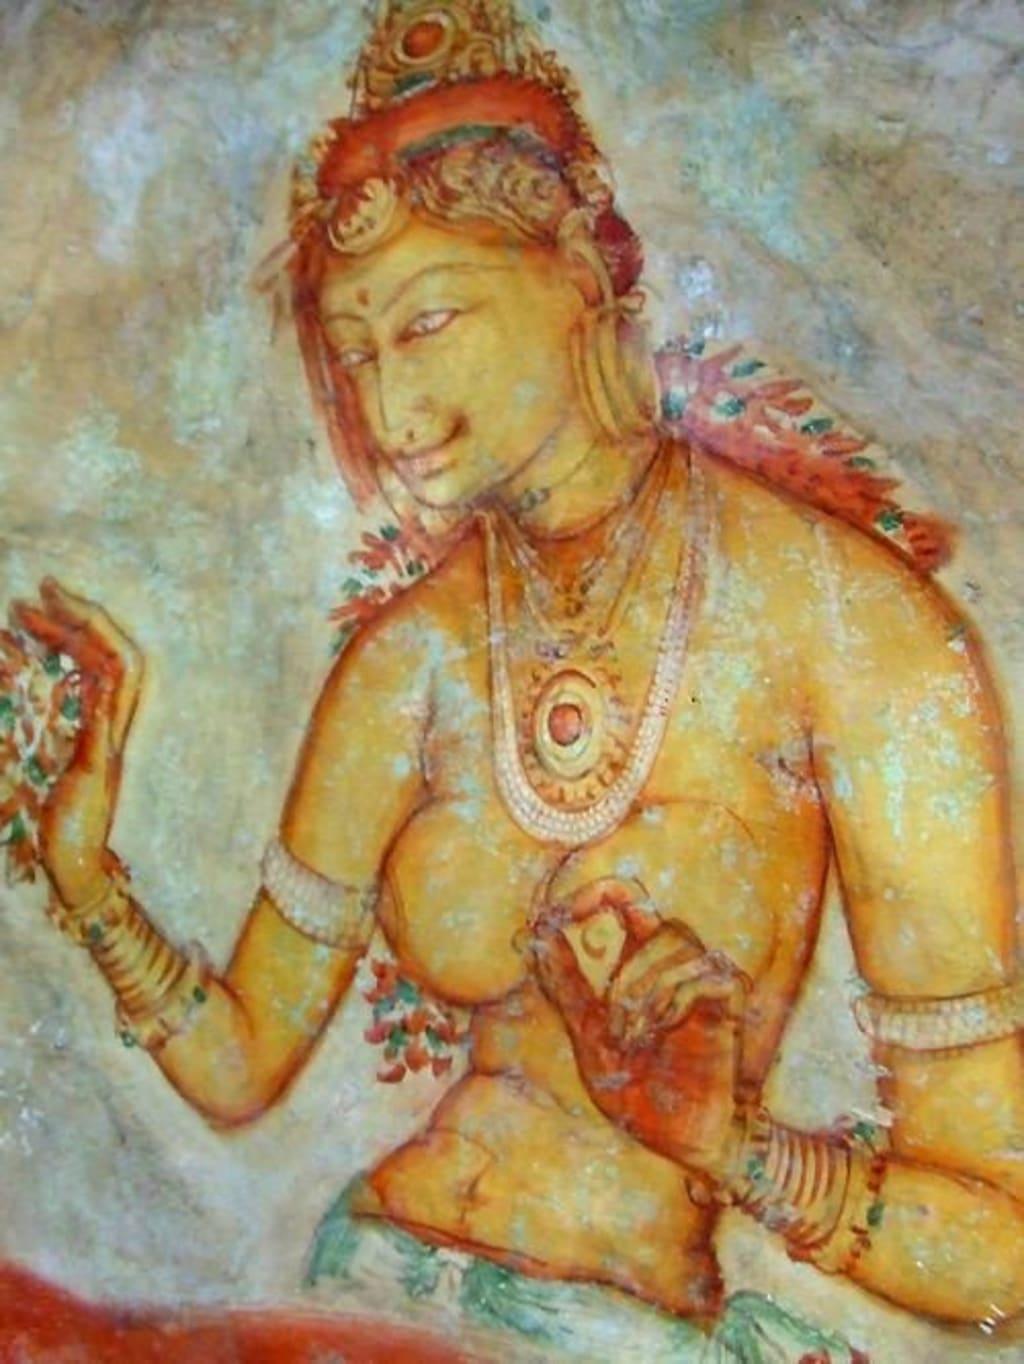 Apparently, Sri Lanka's Anula of Anuradhapura Murdered Her Way Into Power